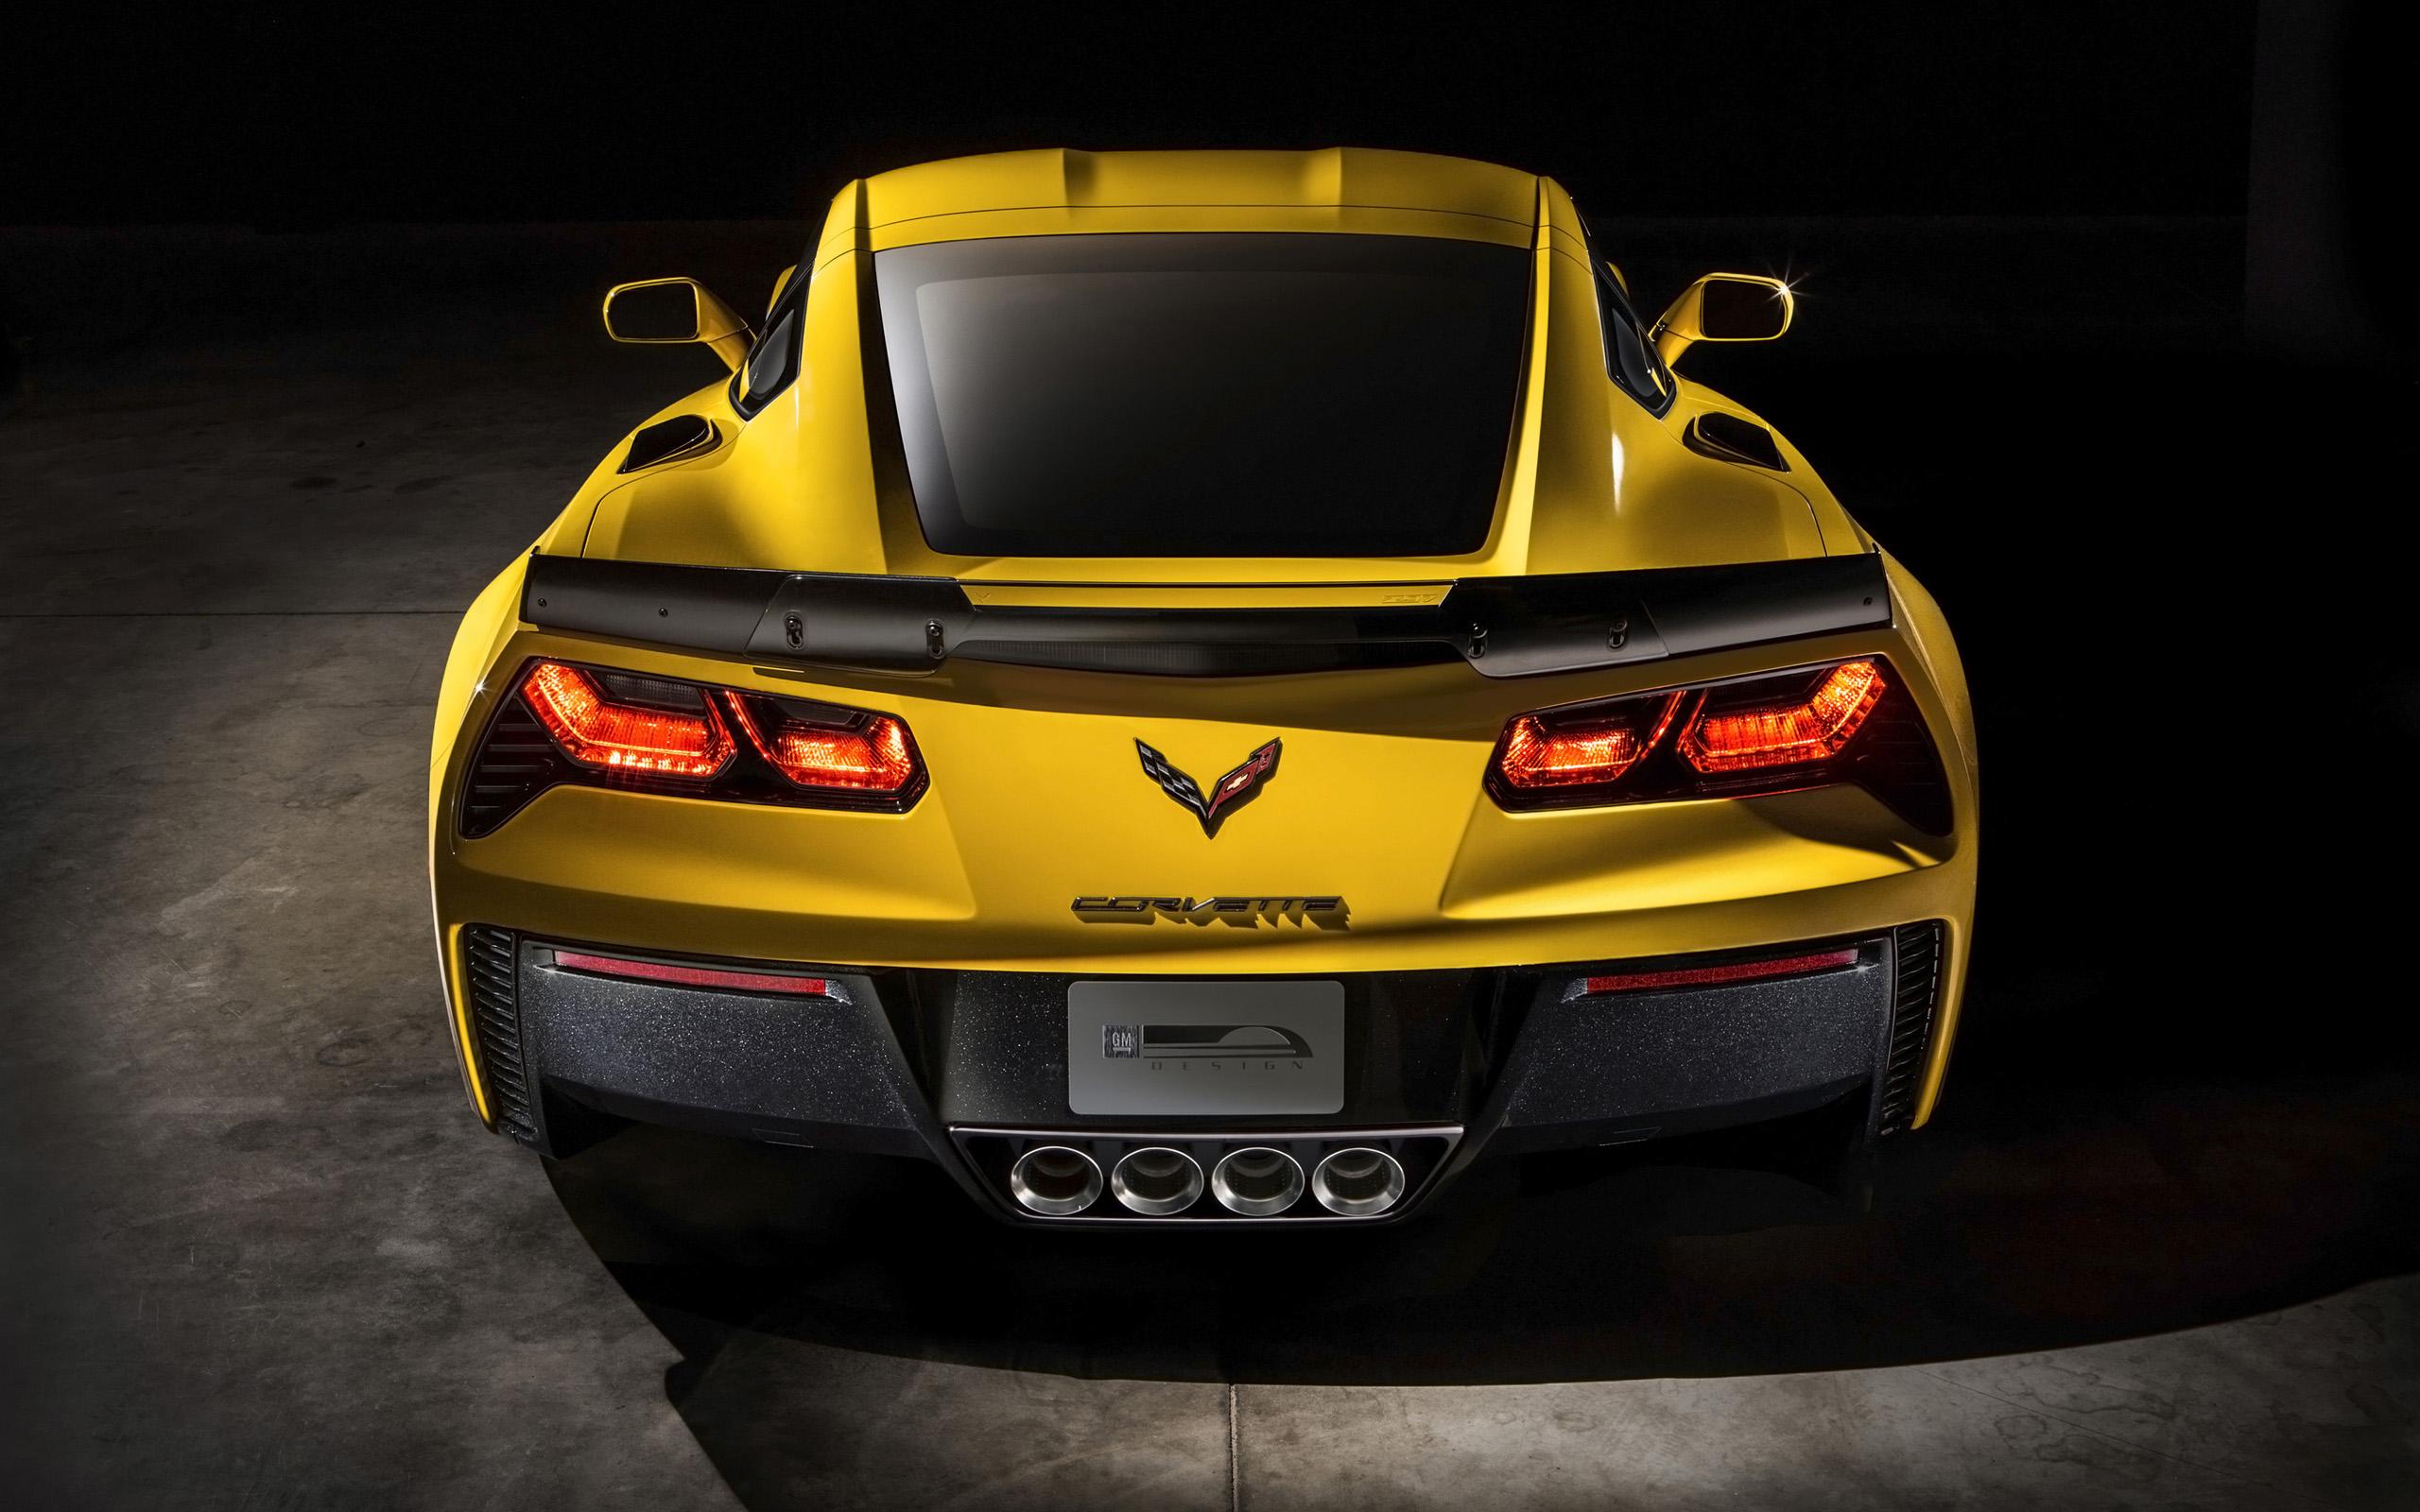 2015 Chevrolet Corvette Z06 3 Wallpaper Hd Car Wallpapers